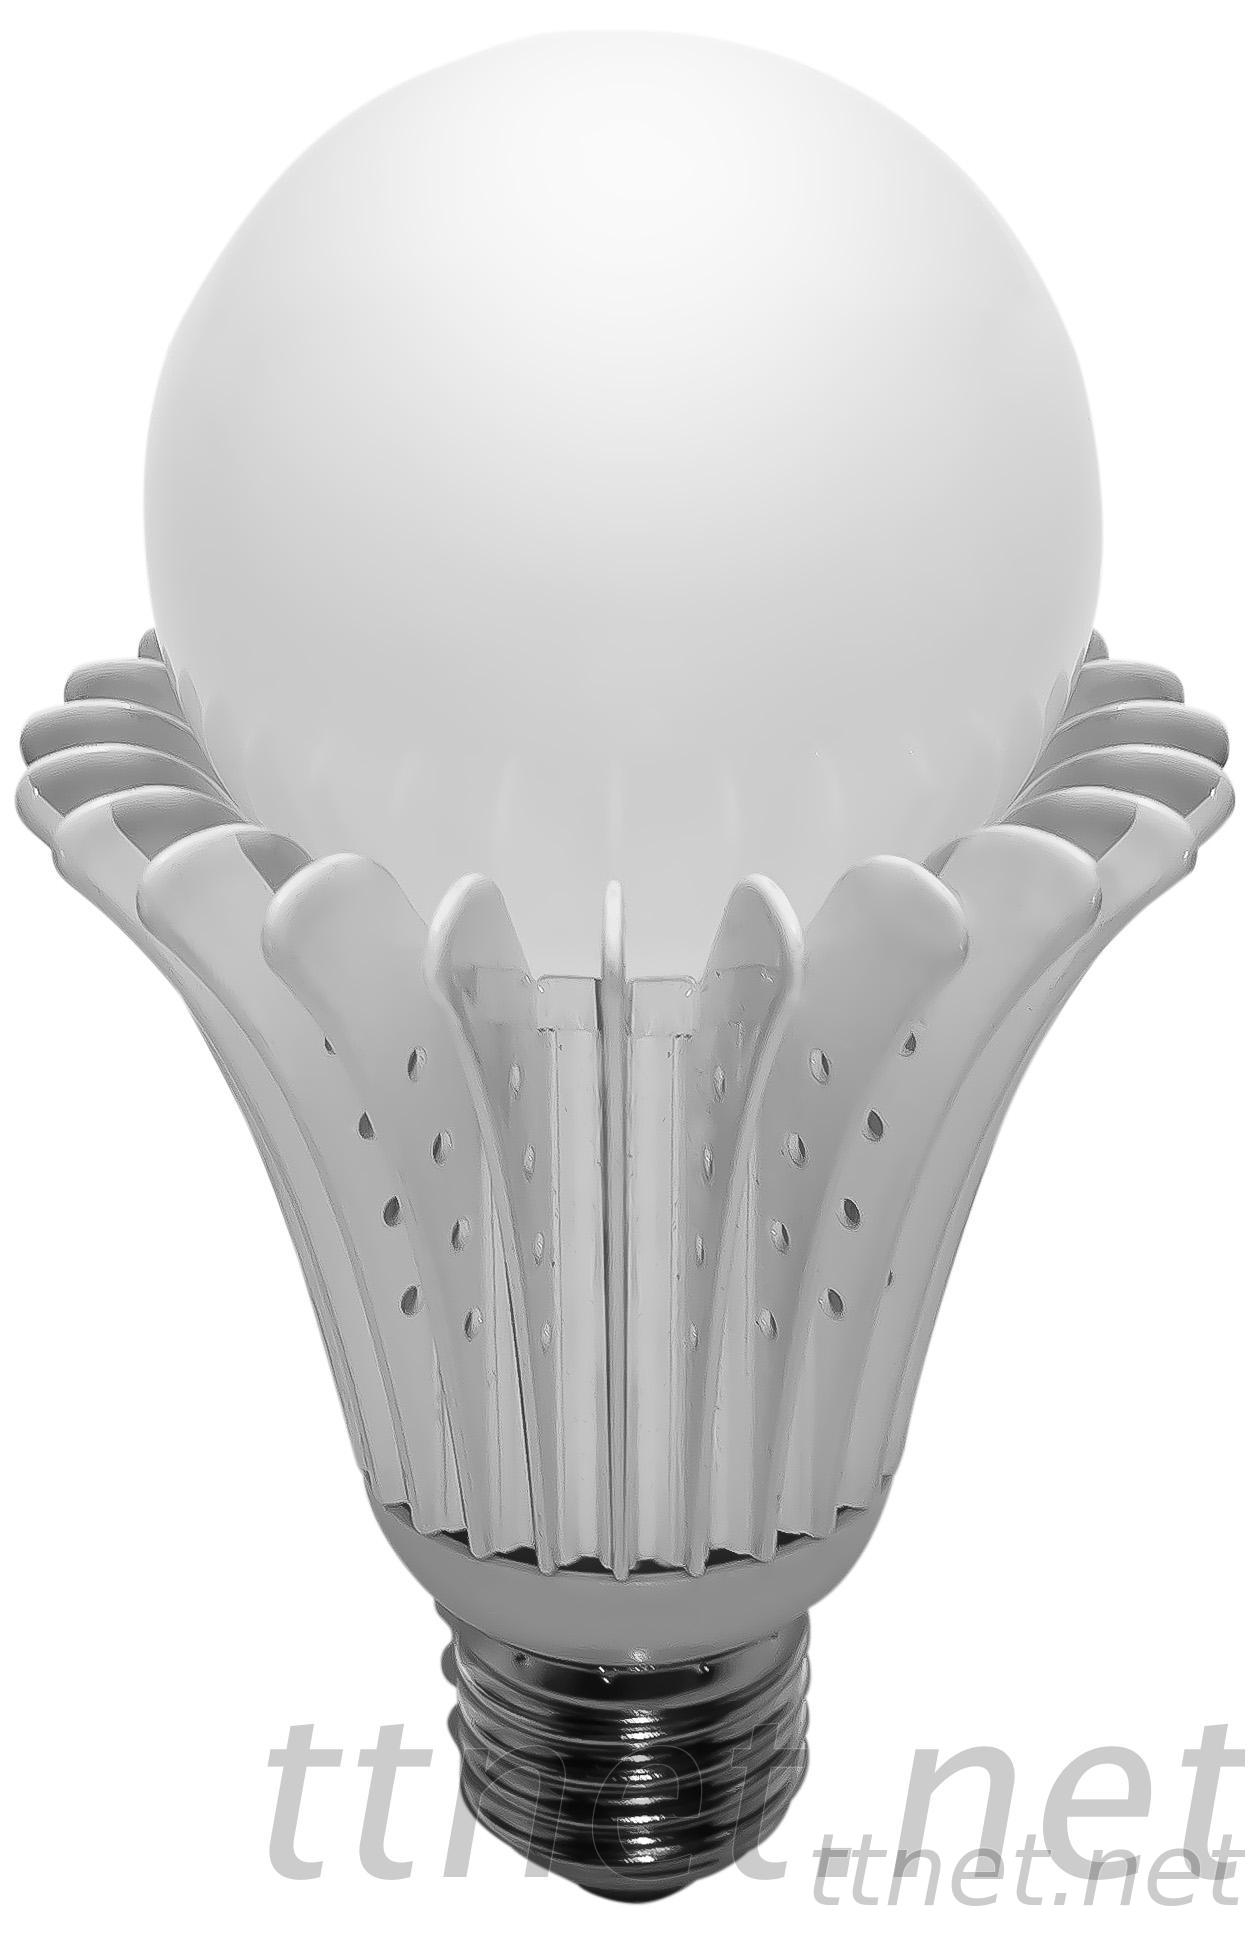 Bulb-RSP-WA2